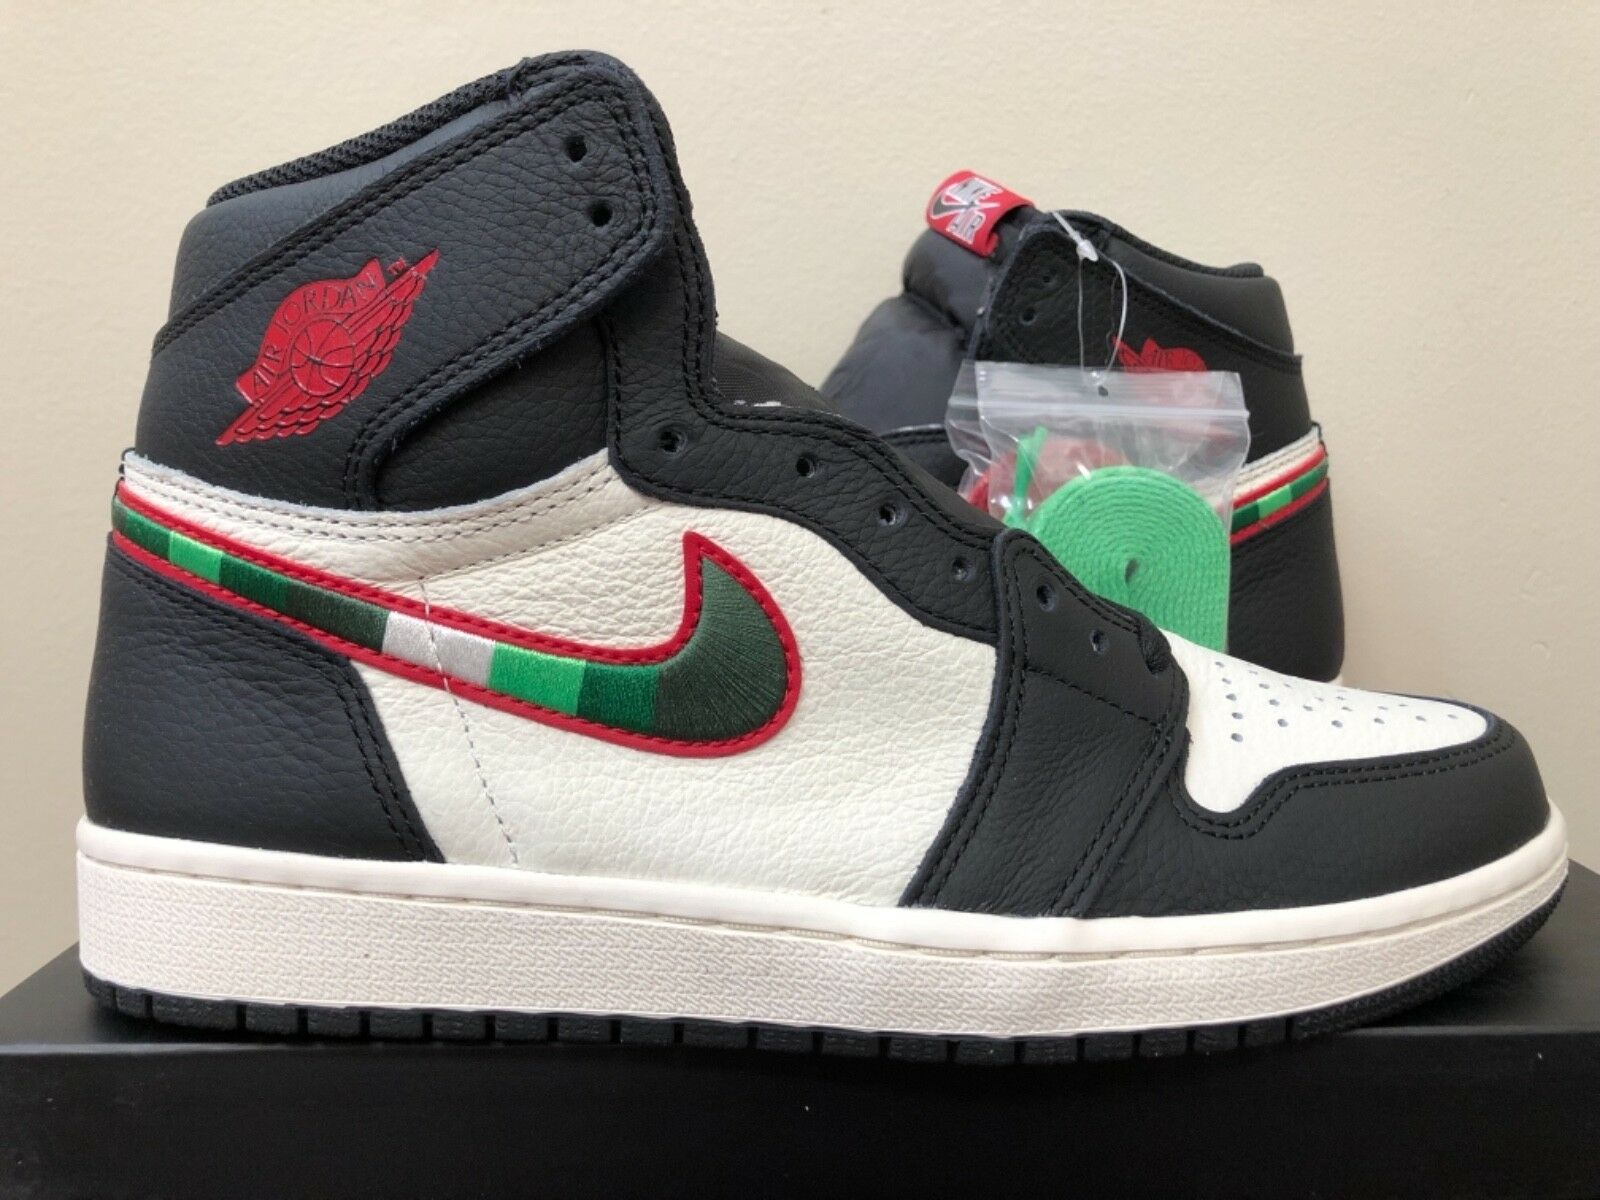 Air Jordan Retro 1 High OG  Sports Illustrated  555088-015 8-15 100% Authentic